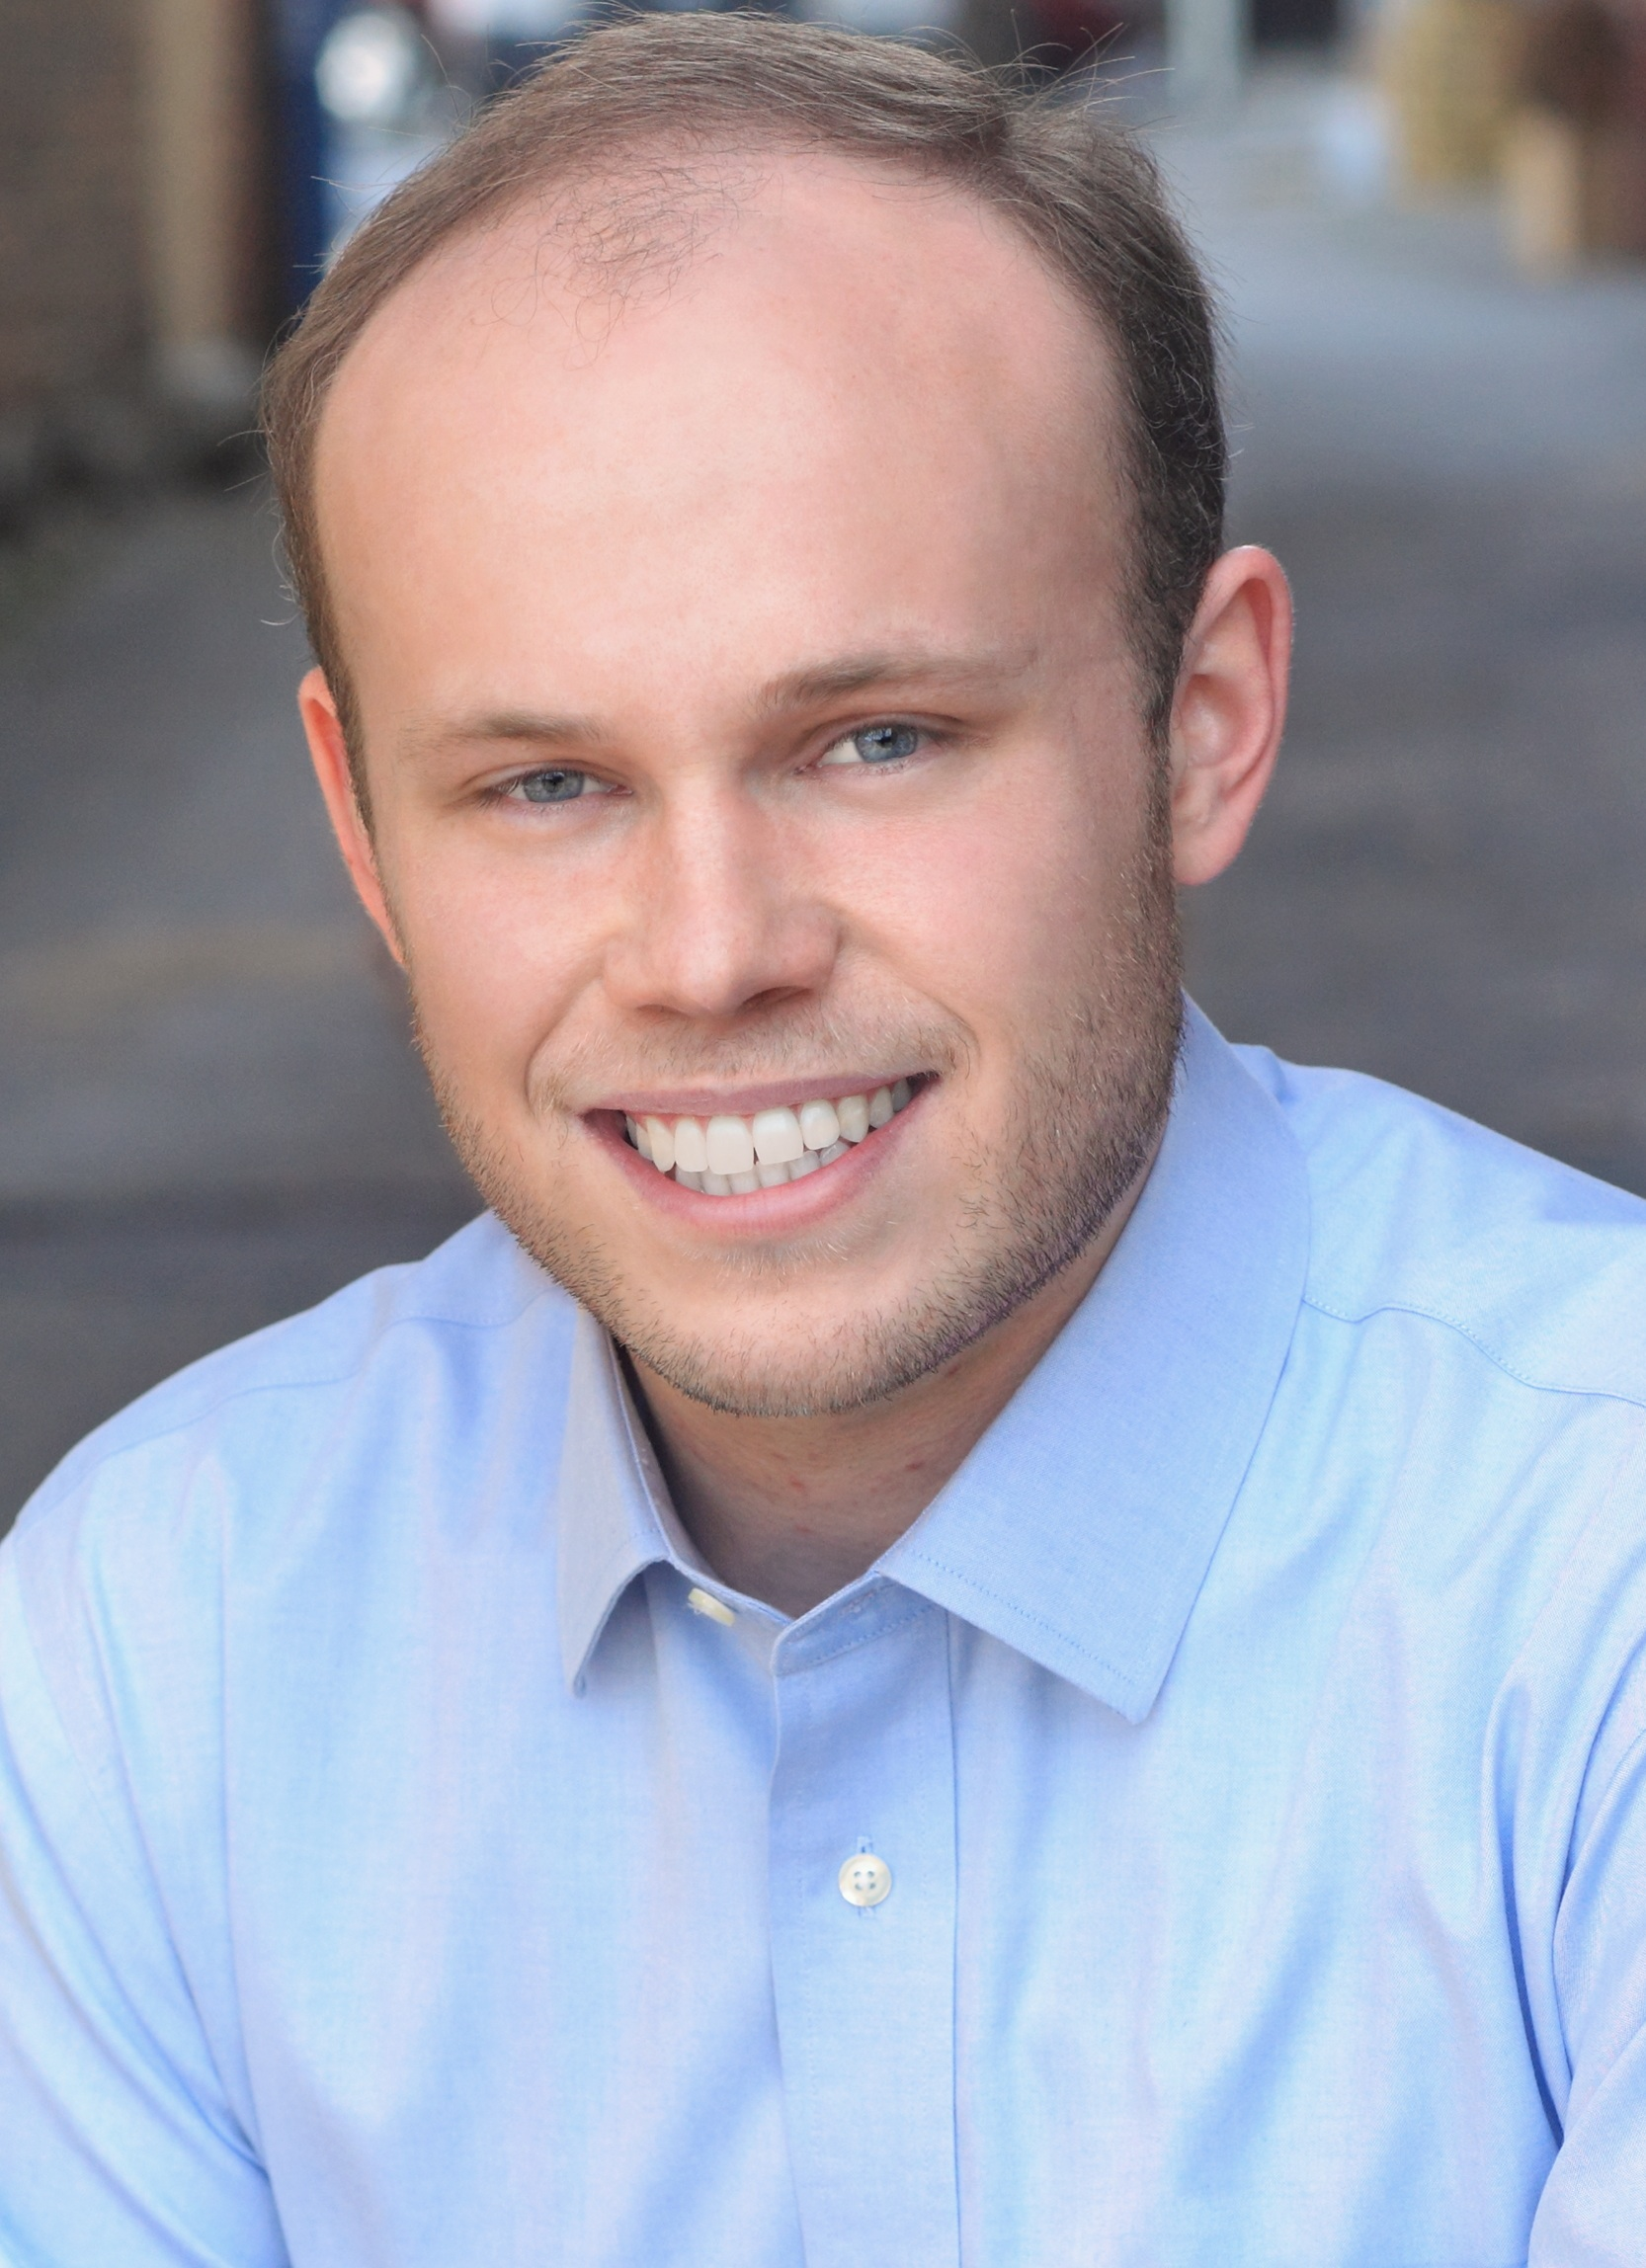 Corey Dalton Hart